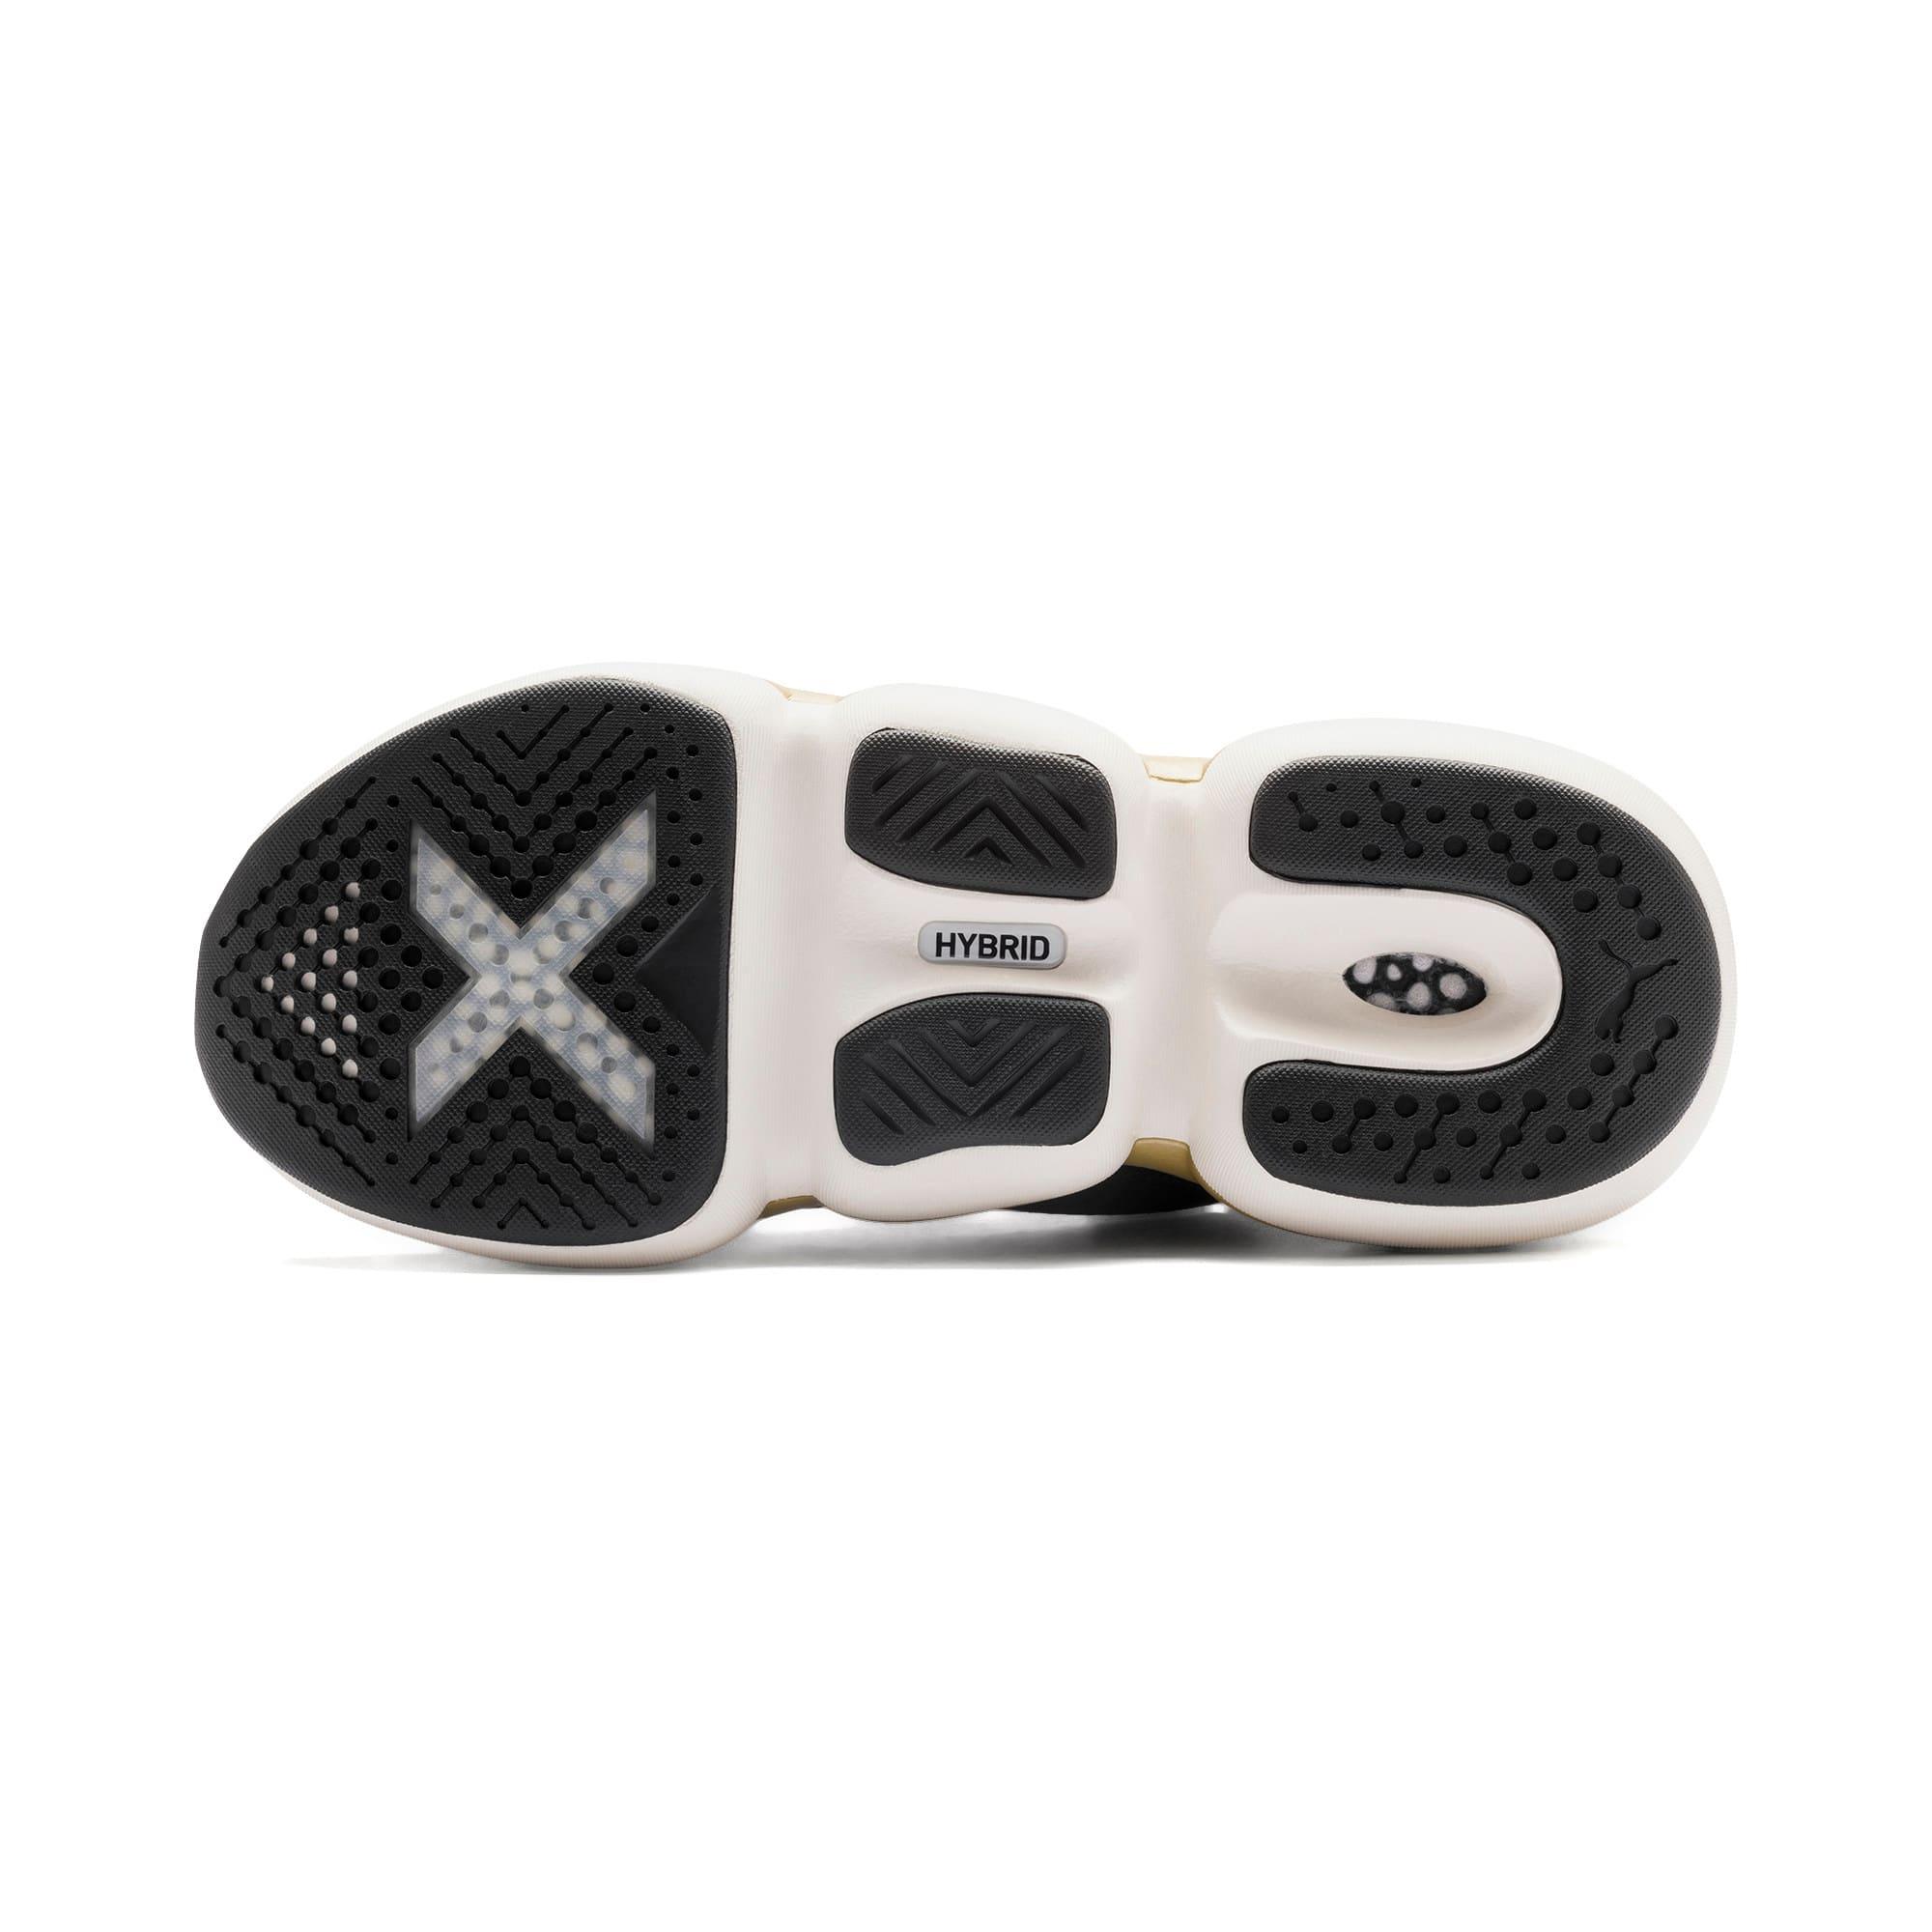 Thumbnail 4 of Mode XT Sweet sportschoenen voor dames, Black- White-Purple, medium